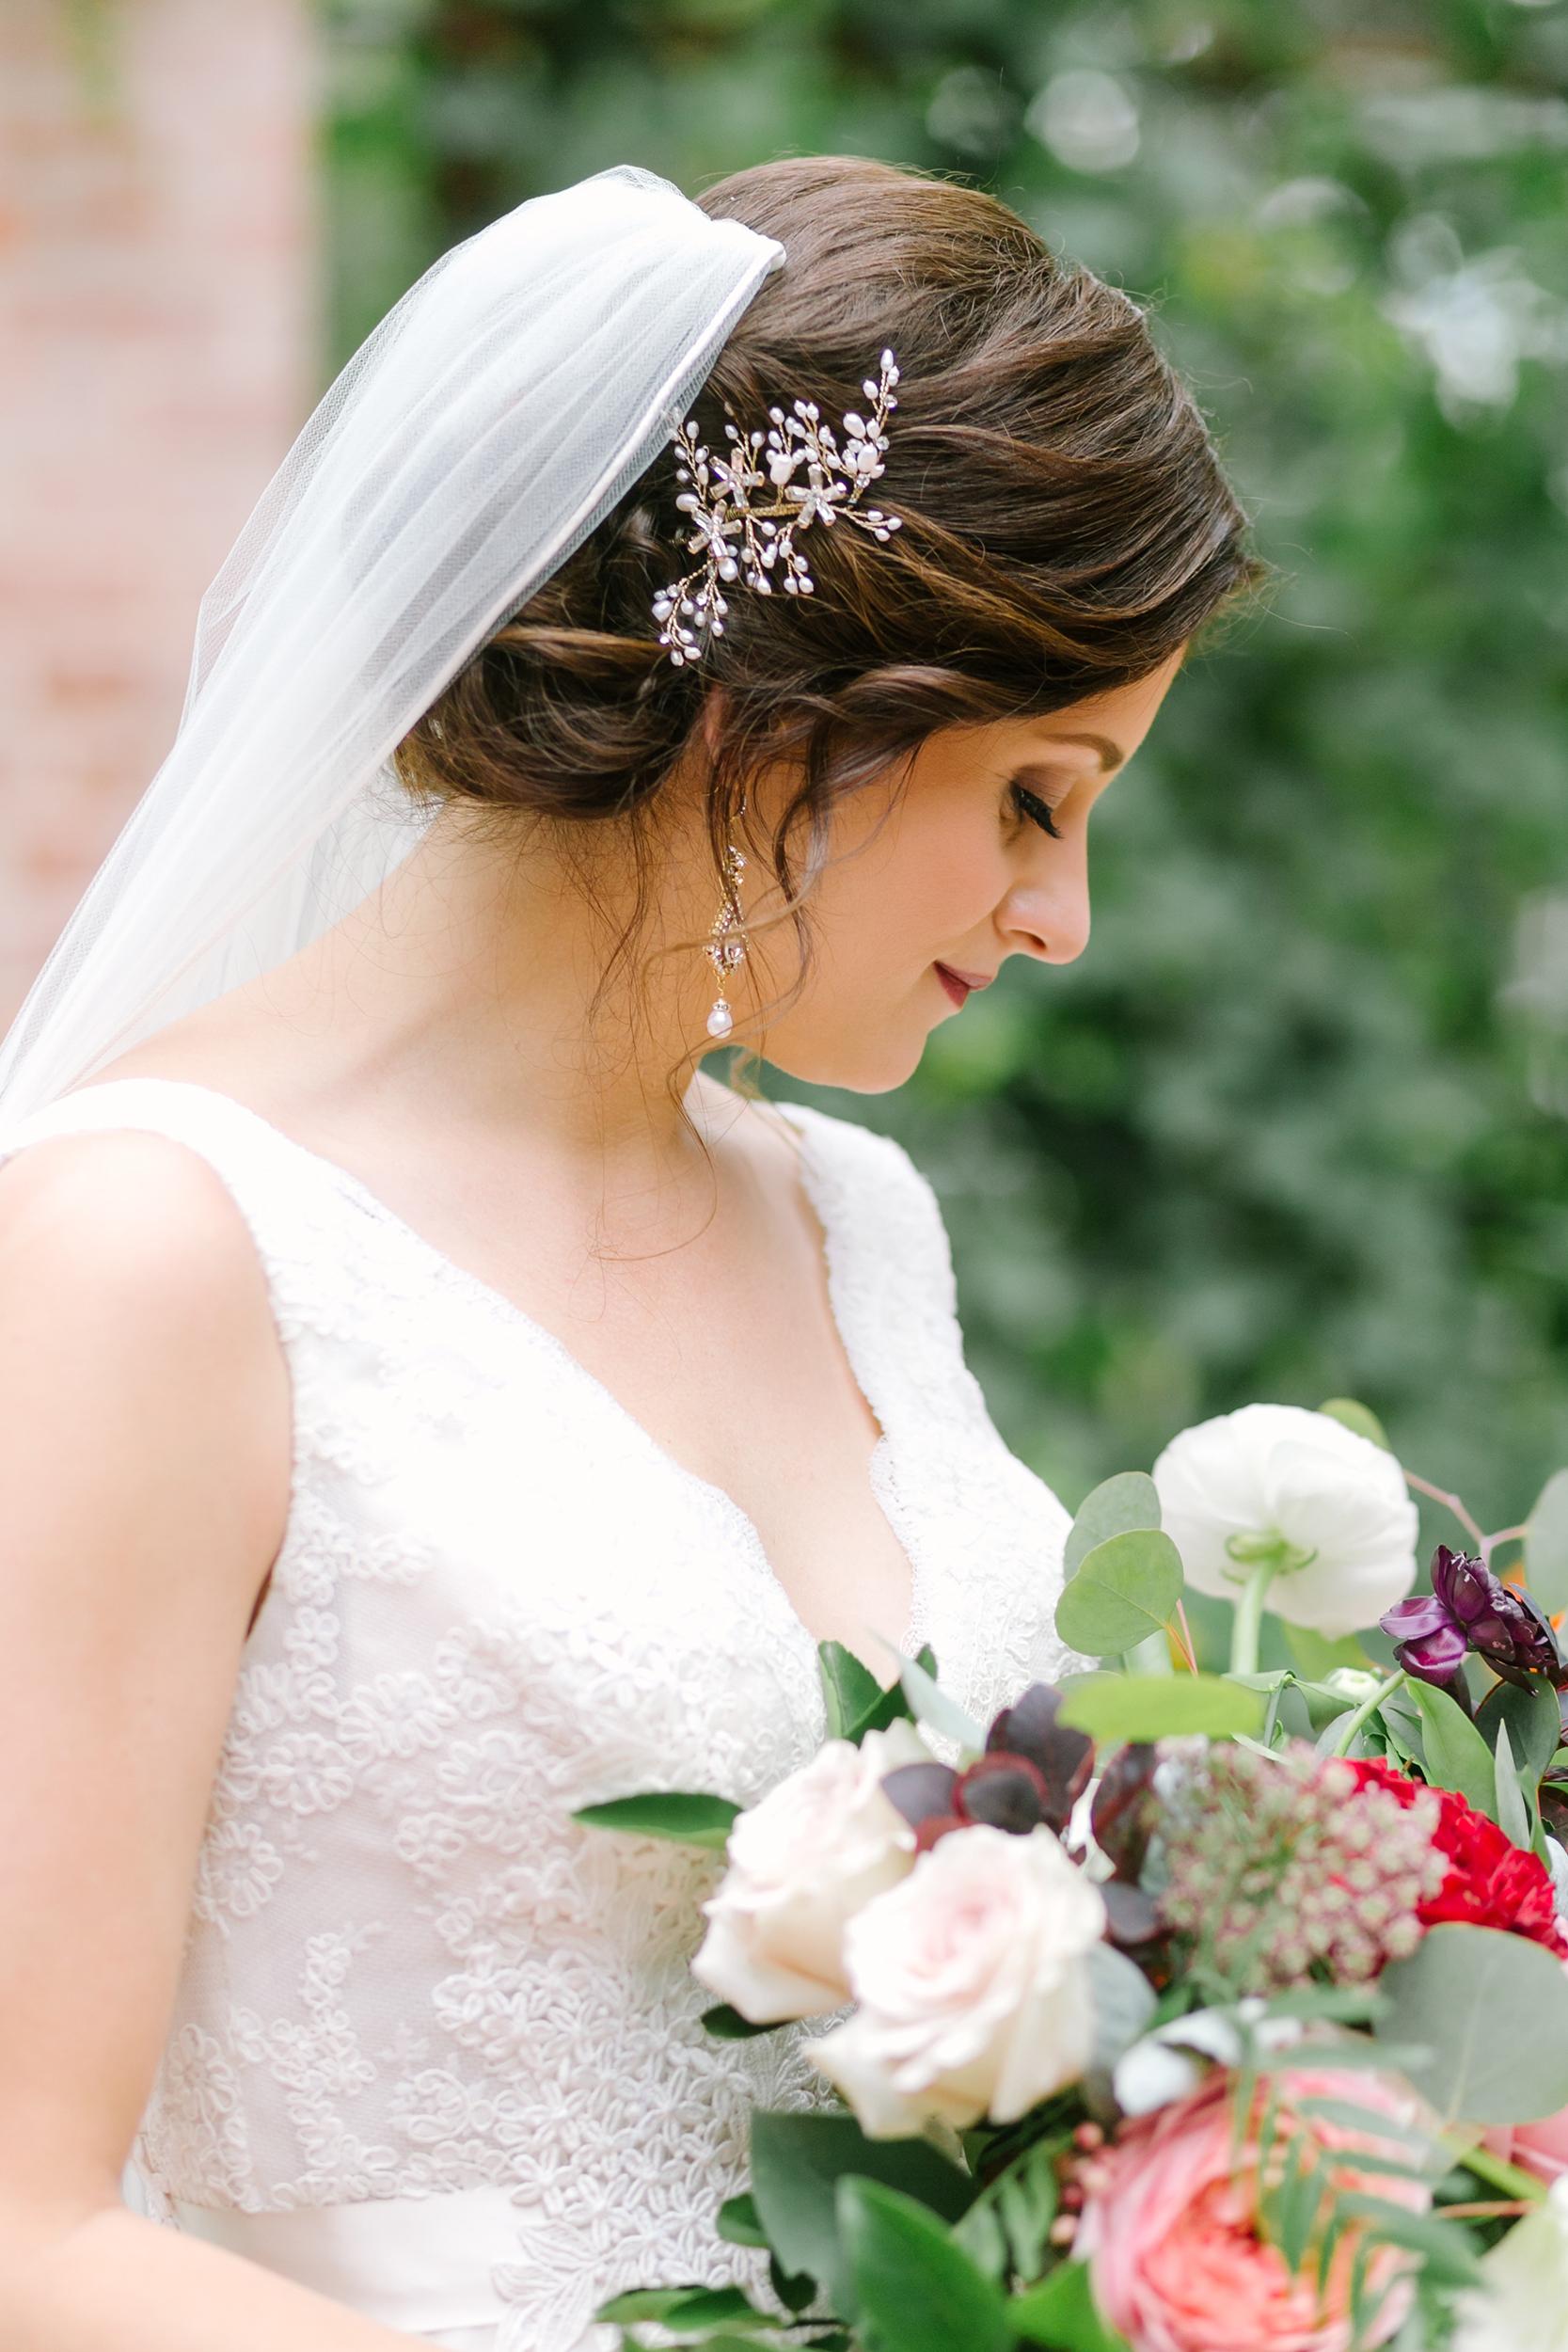 Austin_Wedding_Photographer_Kimberly_Brooke_Photographic_084.jpg